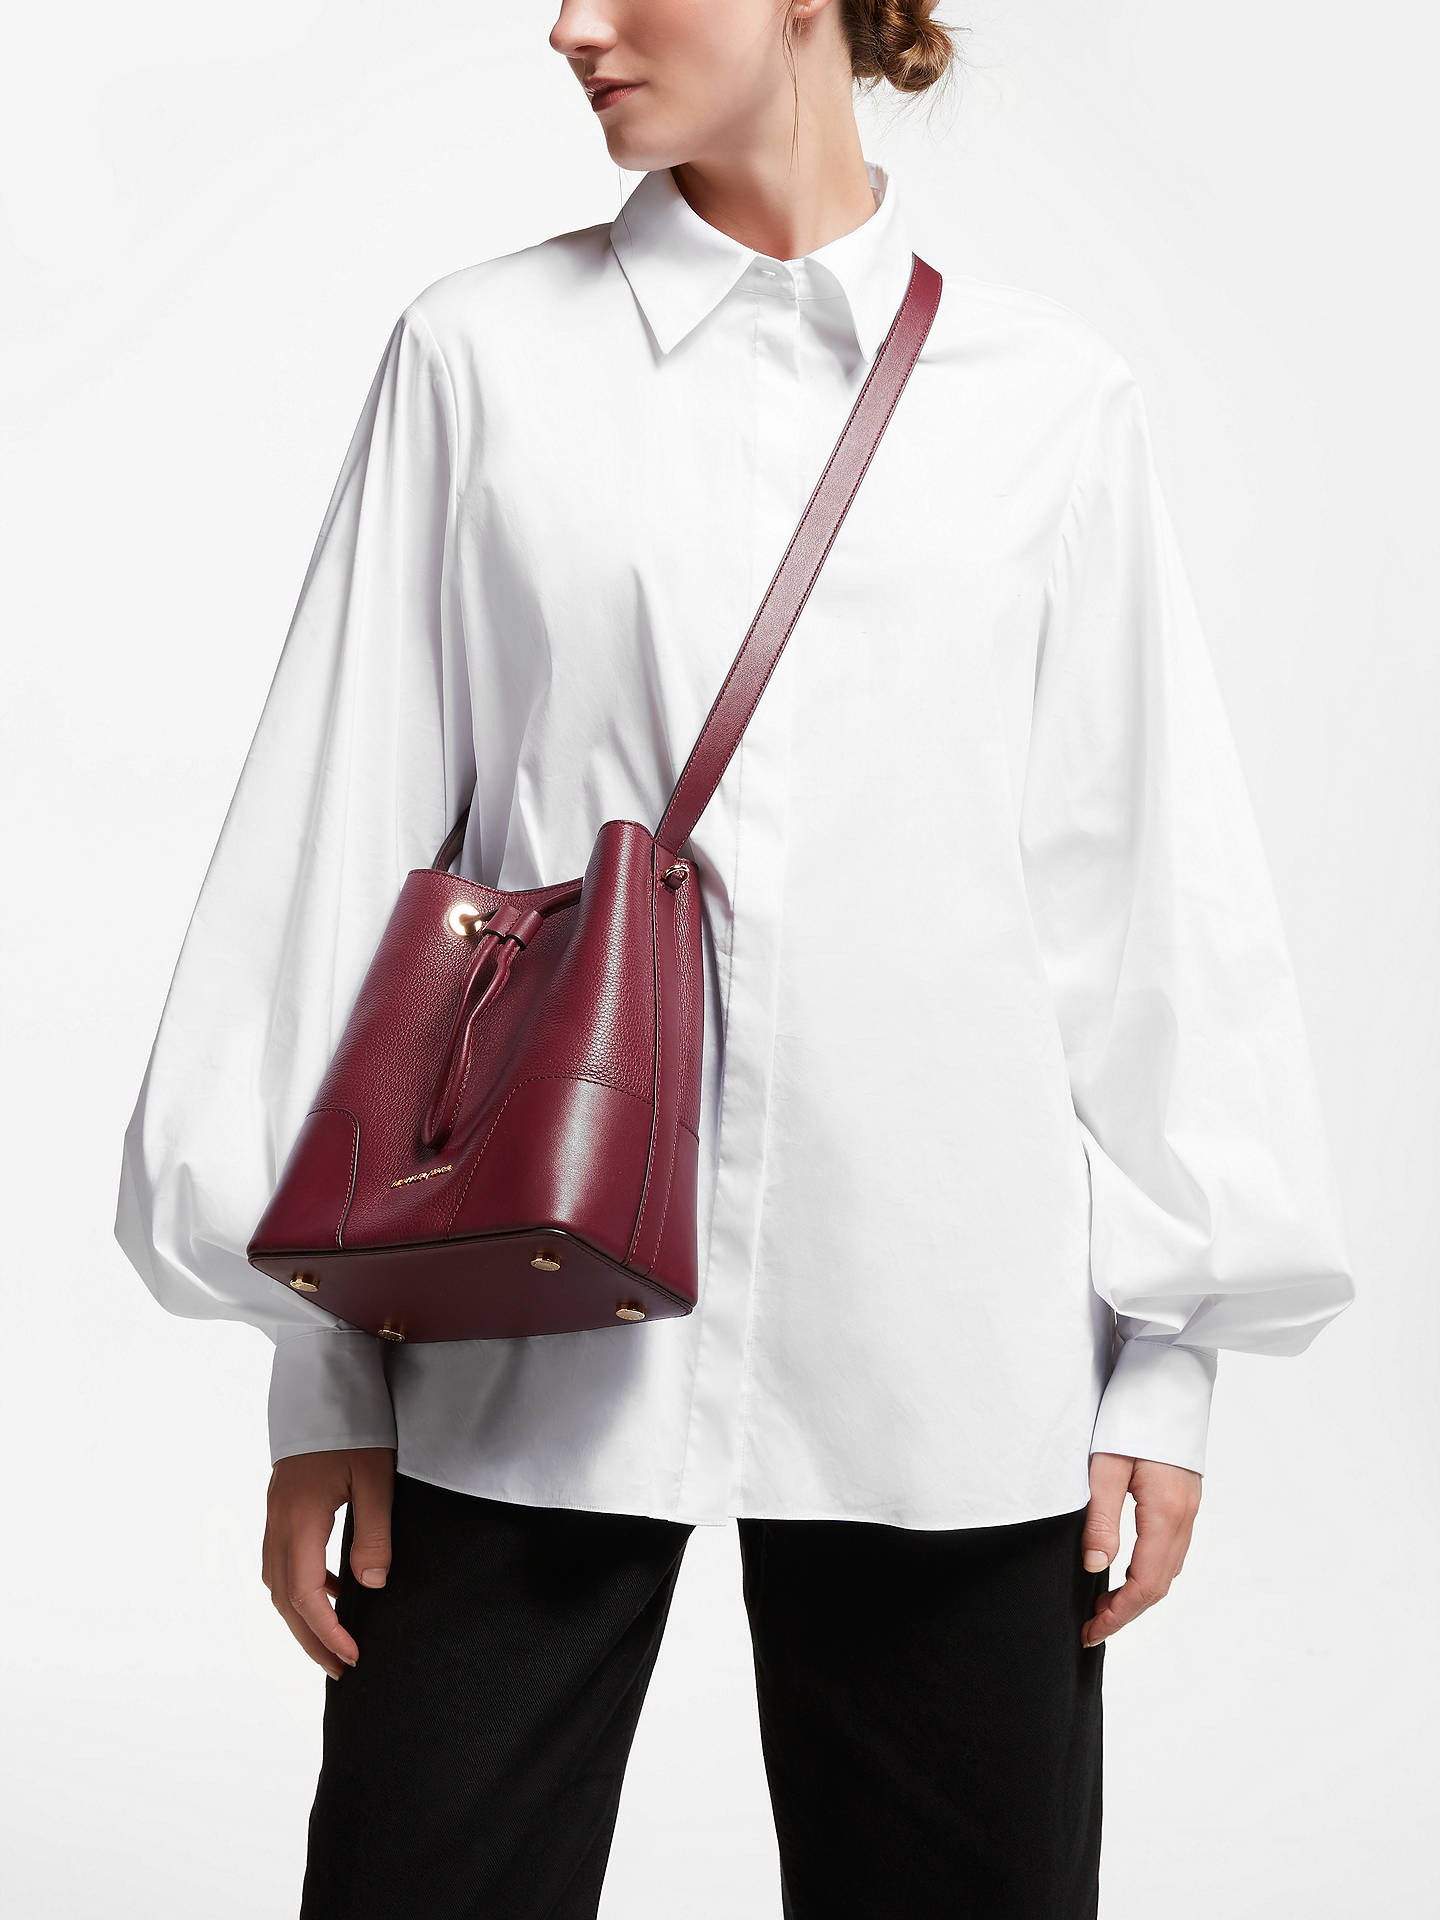 5f2da4b8913b ... Buy MICHAEL Michael Kors Cary Small Leather Bucket Bag, Oxblood Online  at johnlewis.com ...